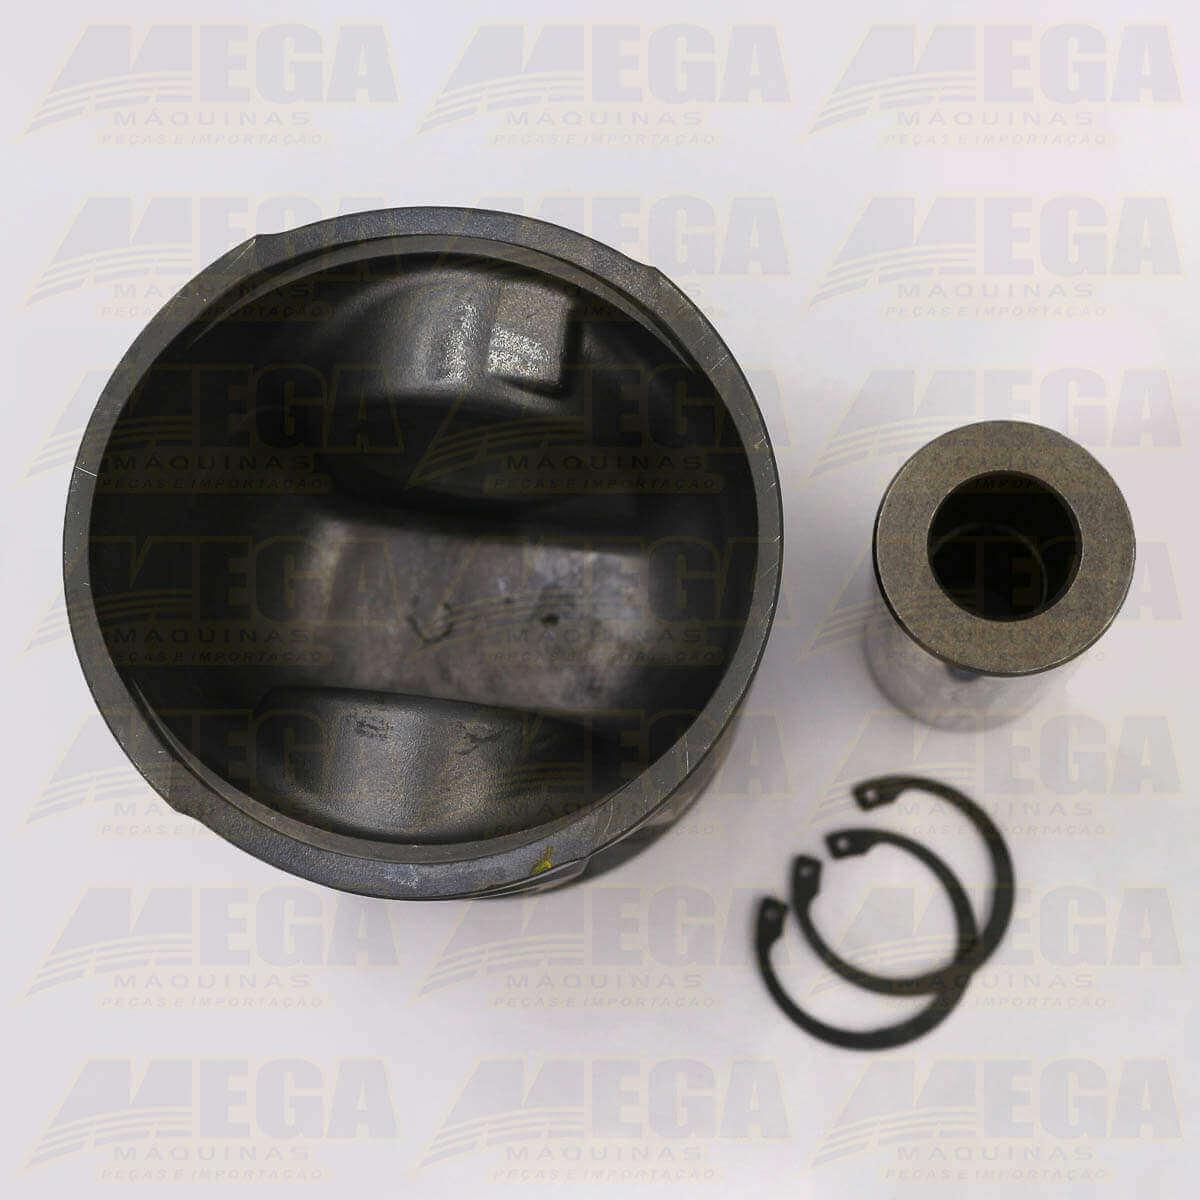 Kit Pistão com Anéis Motor DieselMax 444 Aspirado 320/09210 32009210